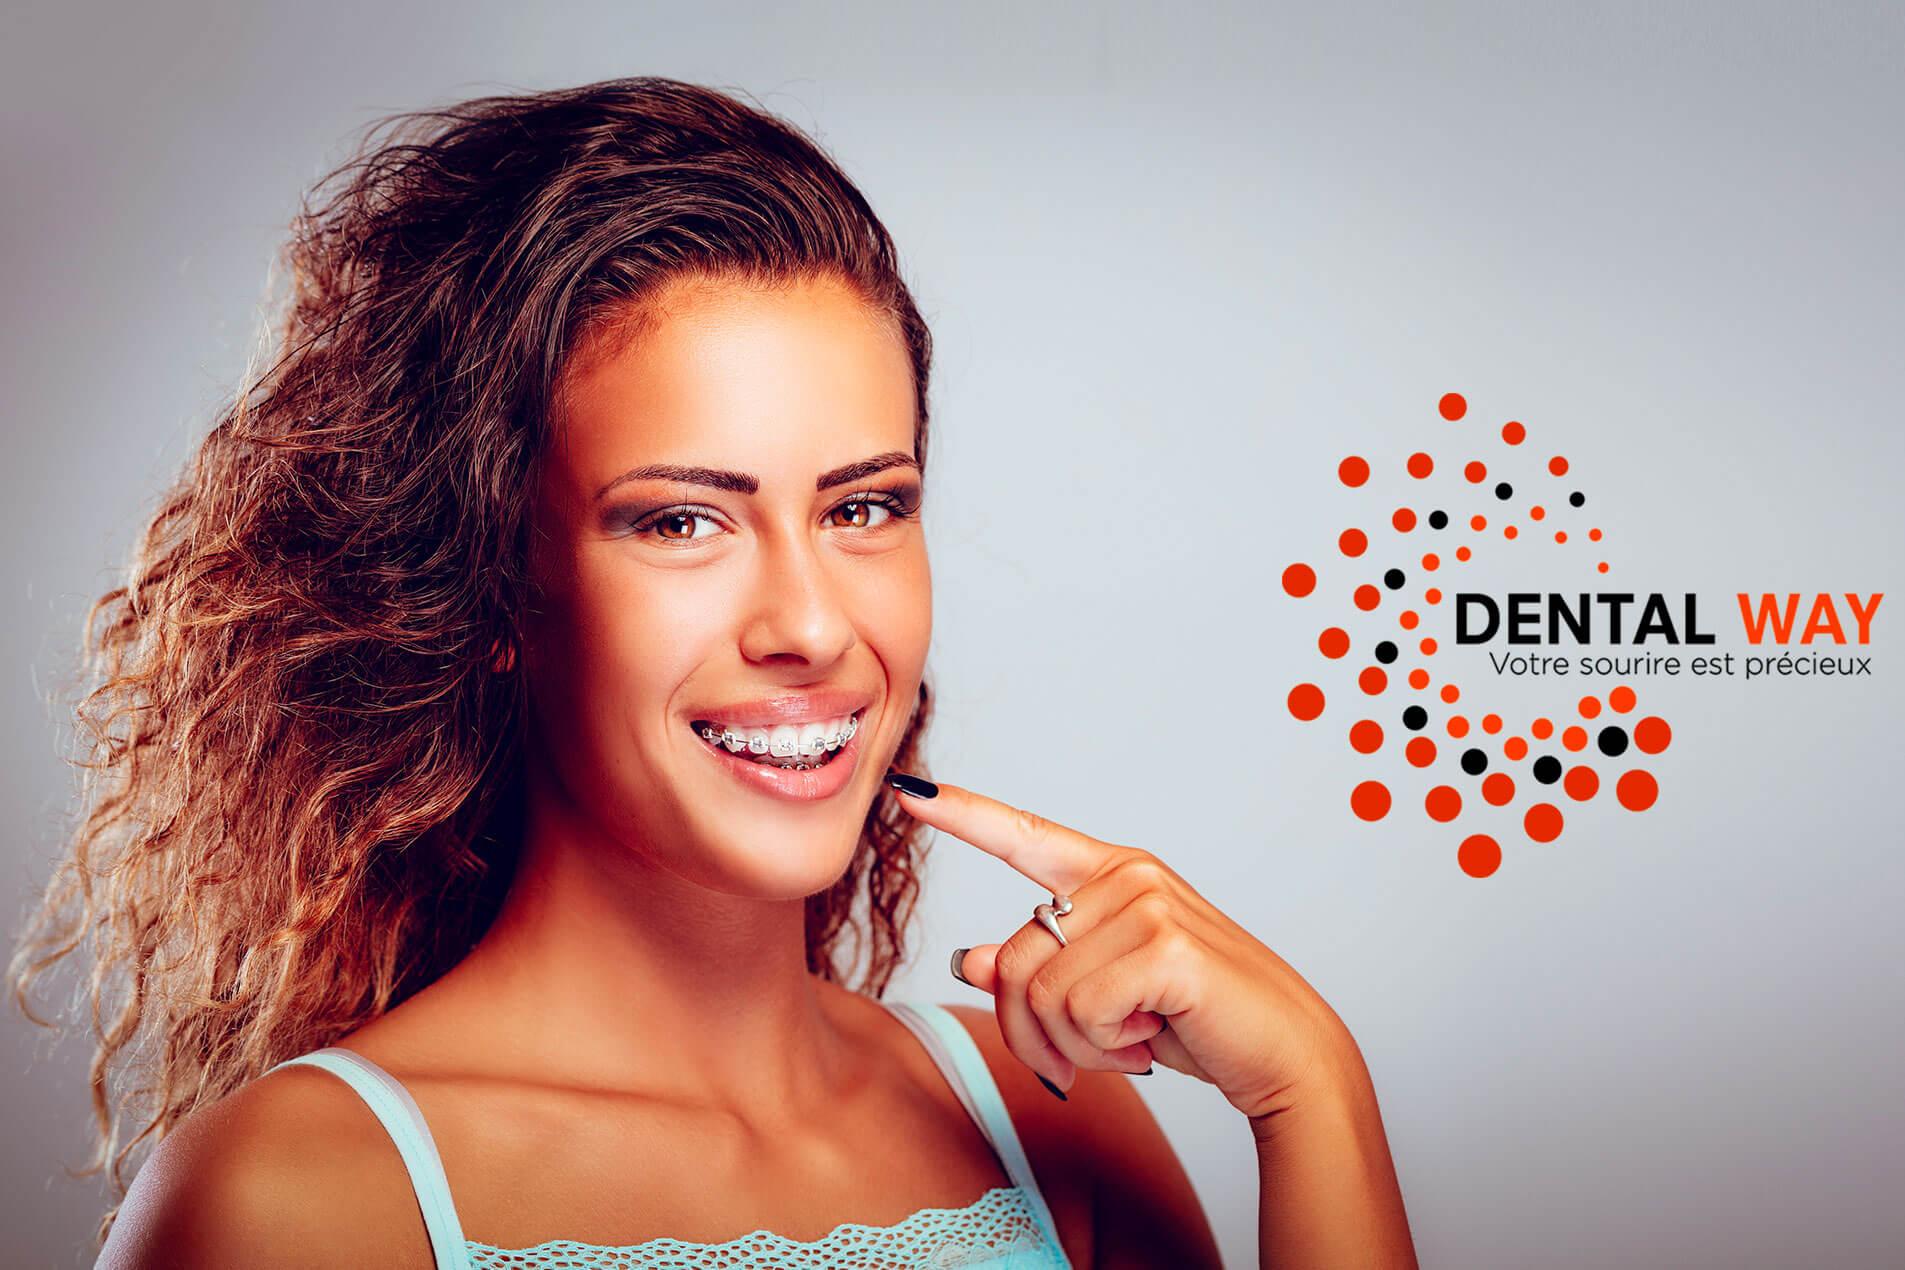 orthodontie multi attache-dentiste beaujolais